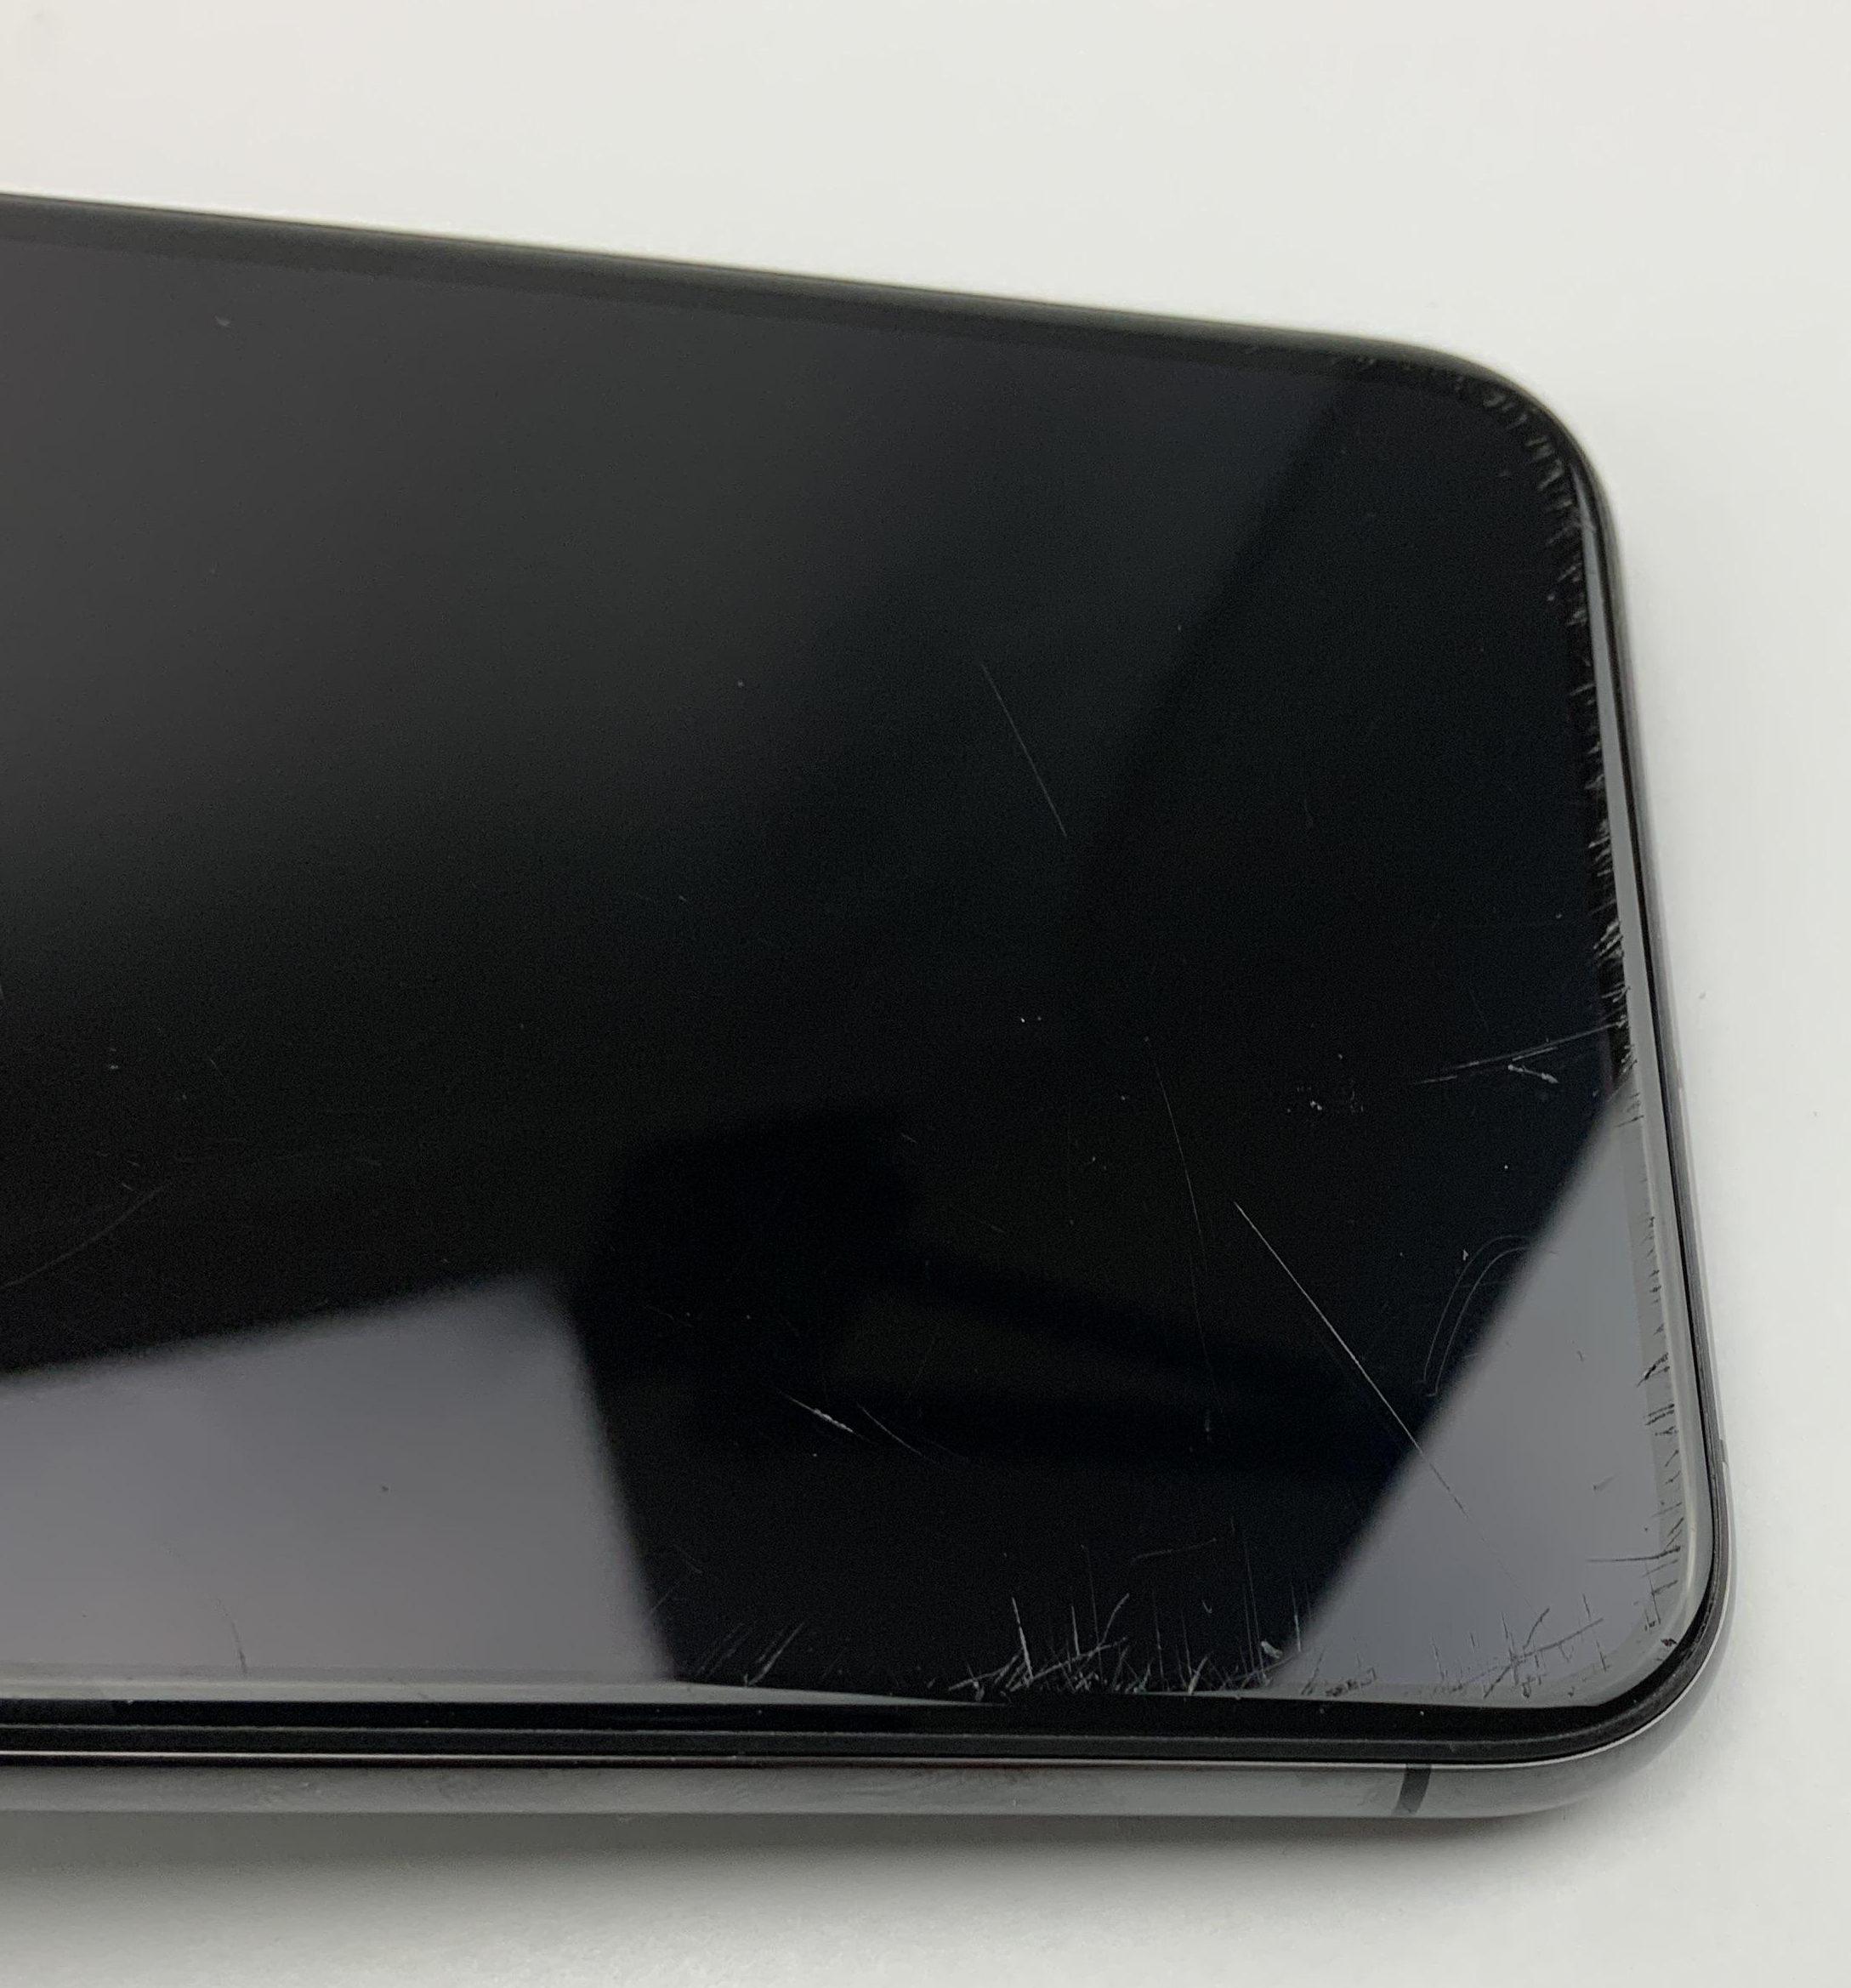 iPhone XS 64GB, 64GB, Space Gray, Bild 4